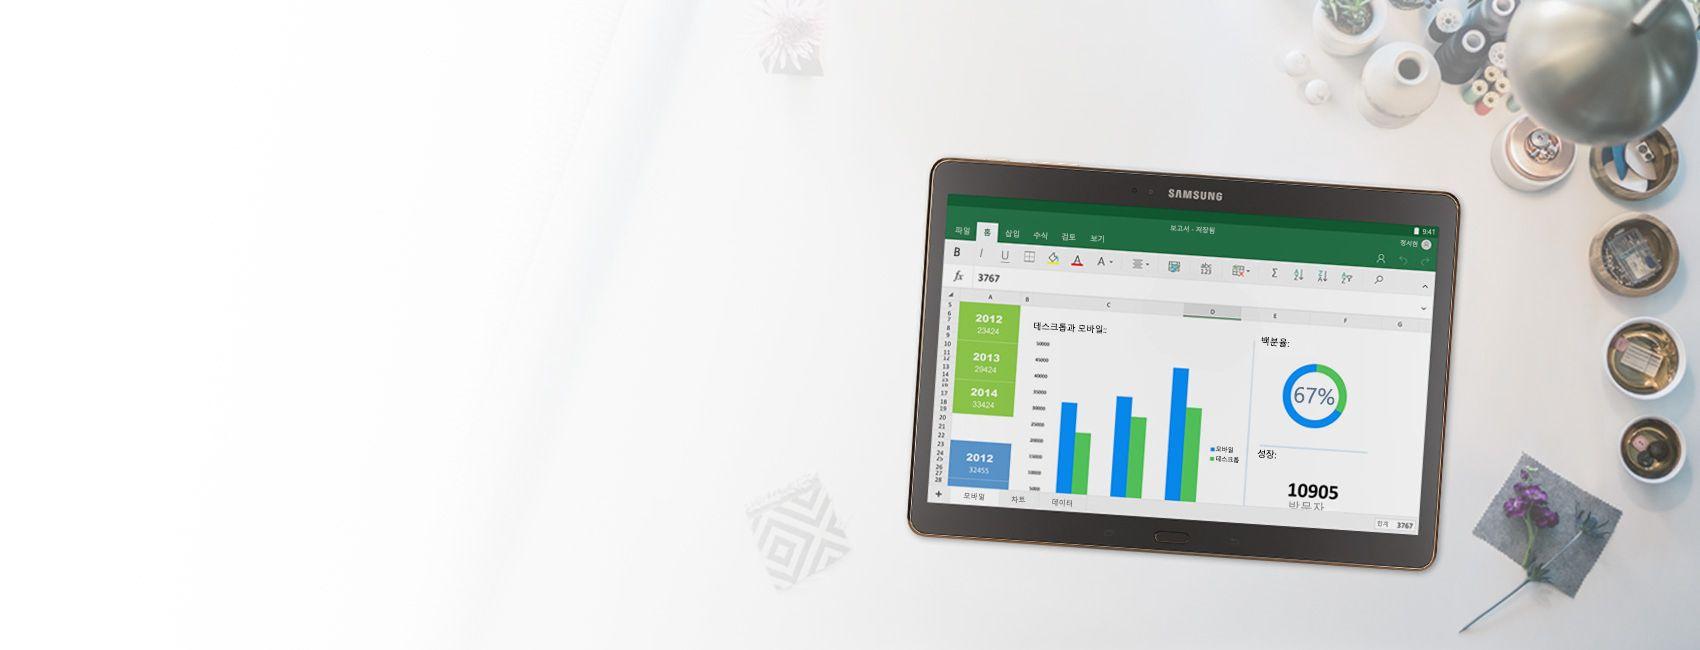 Excel 보고서에 차트가 표시된 태블릿